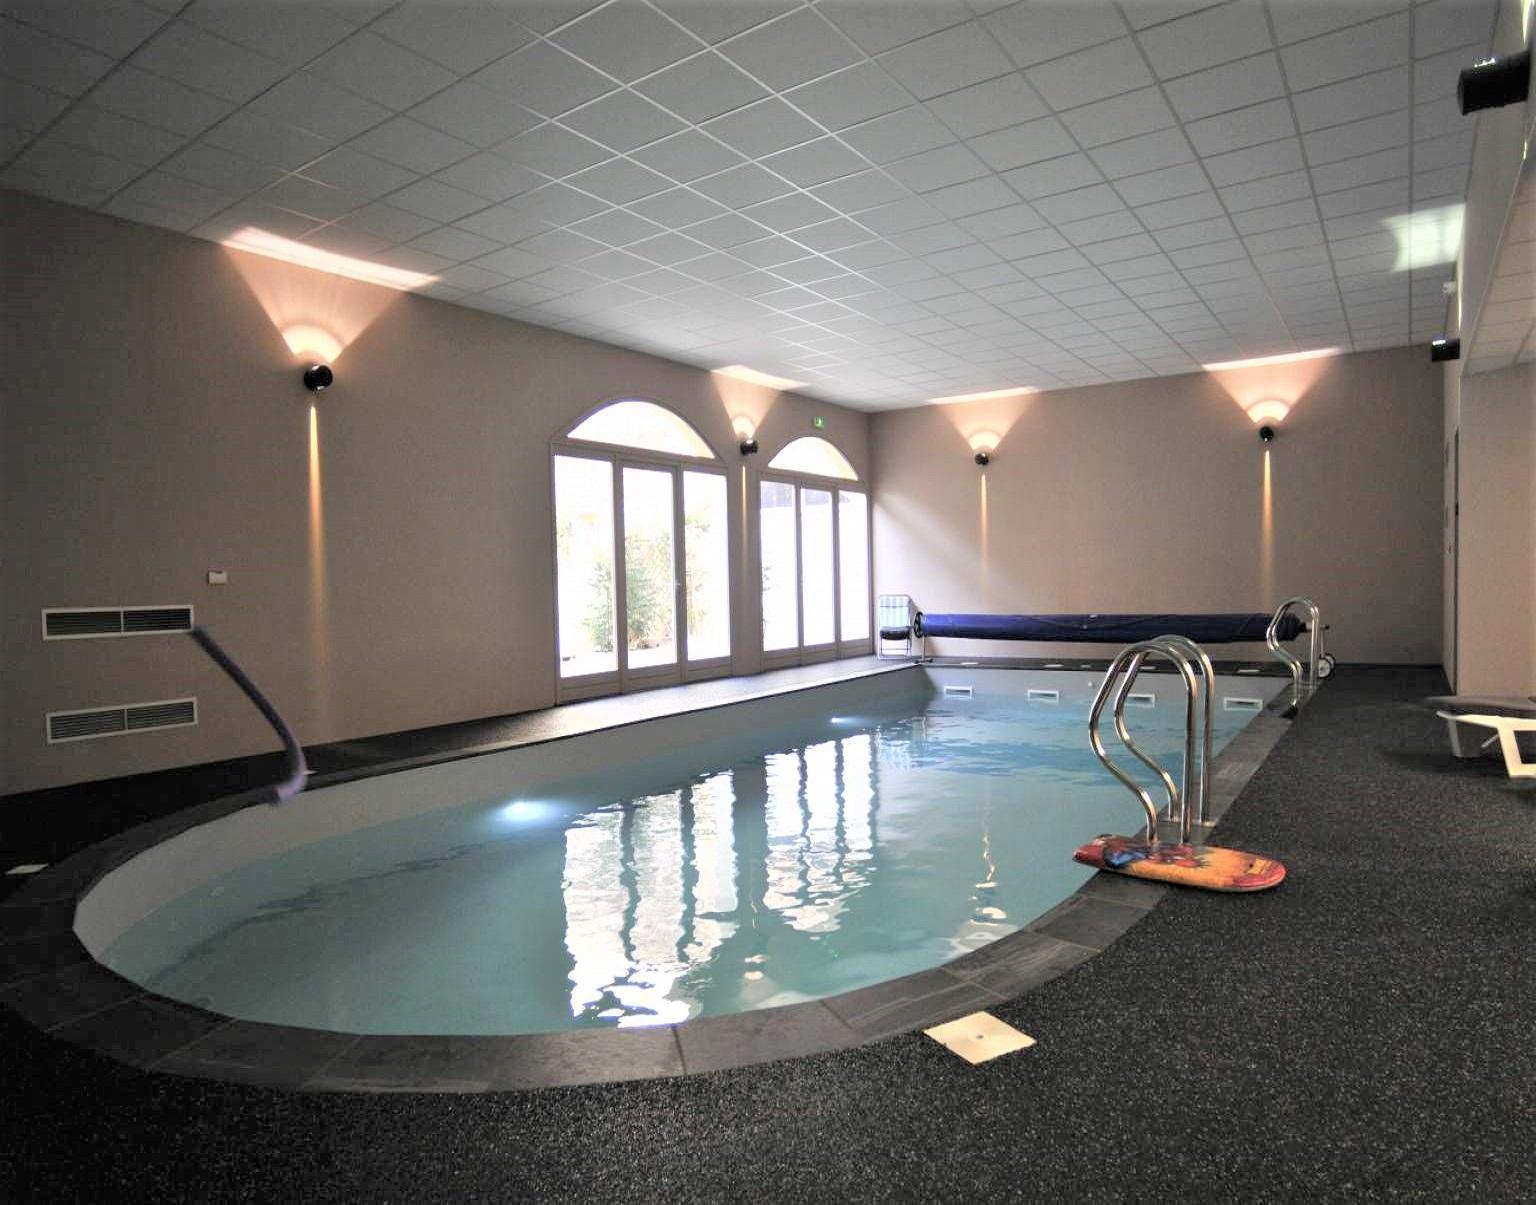 chateau-des-ayres-losere-ocitanie-piscine